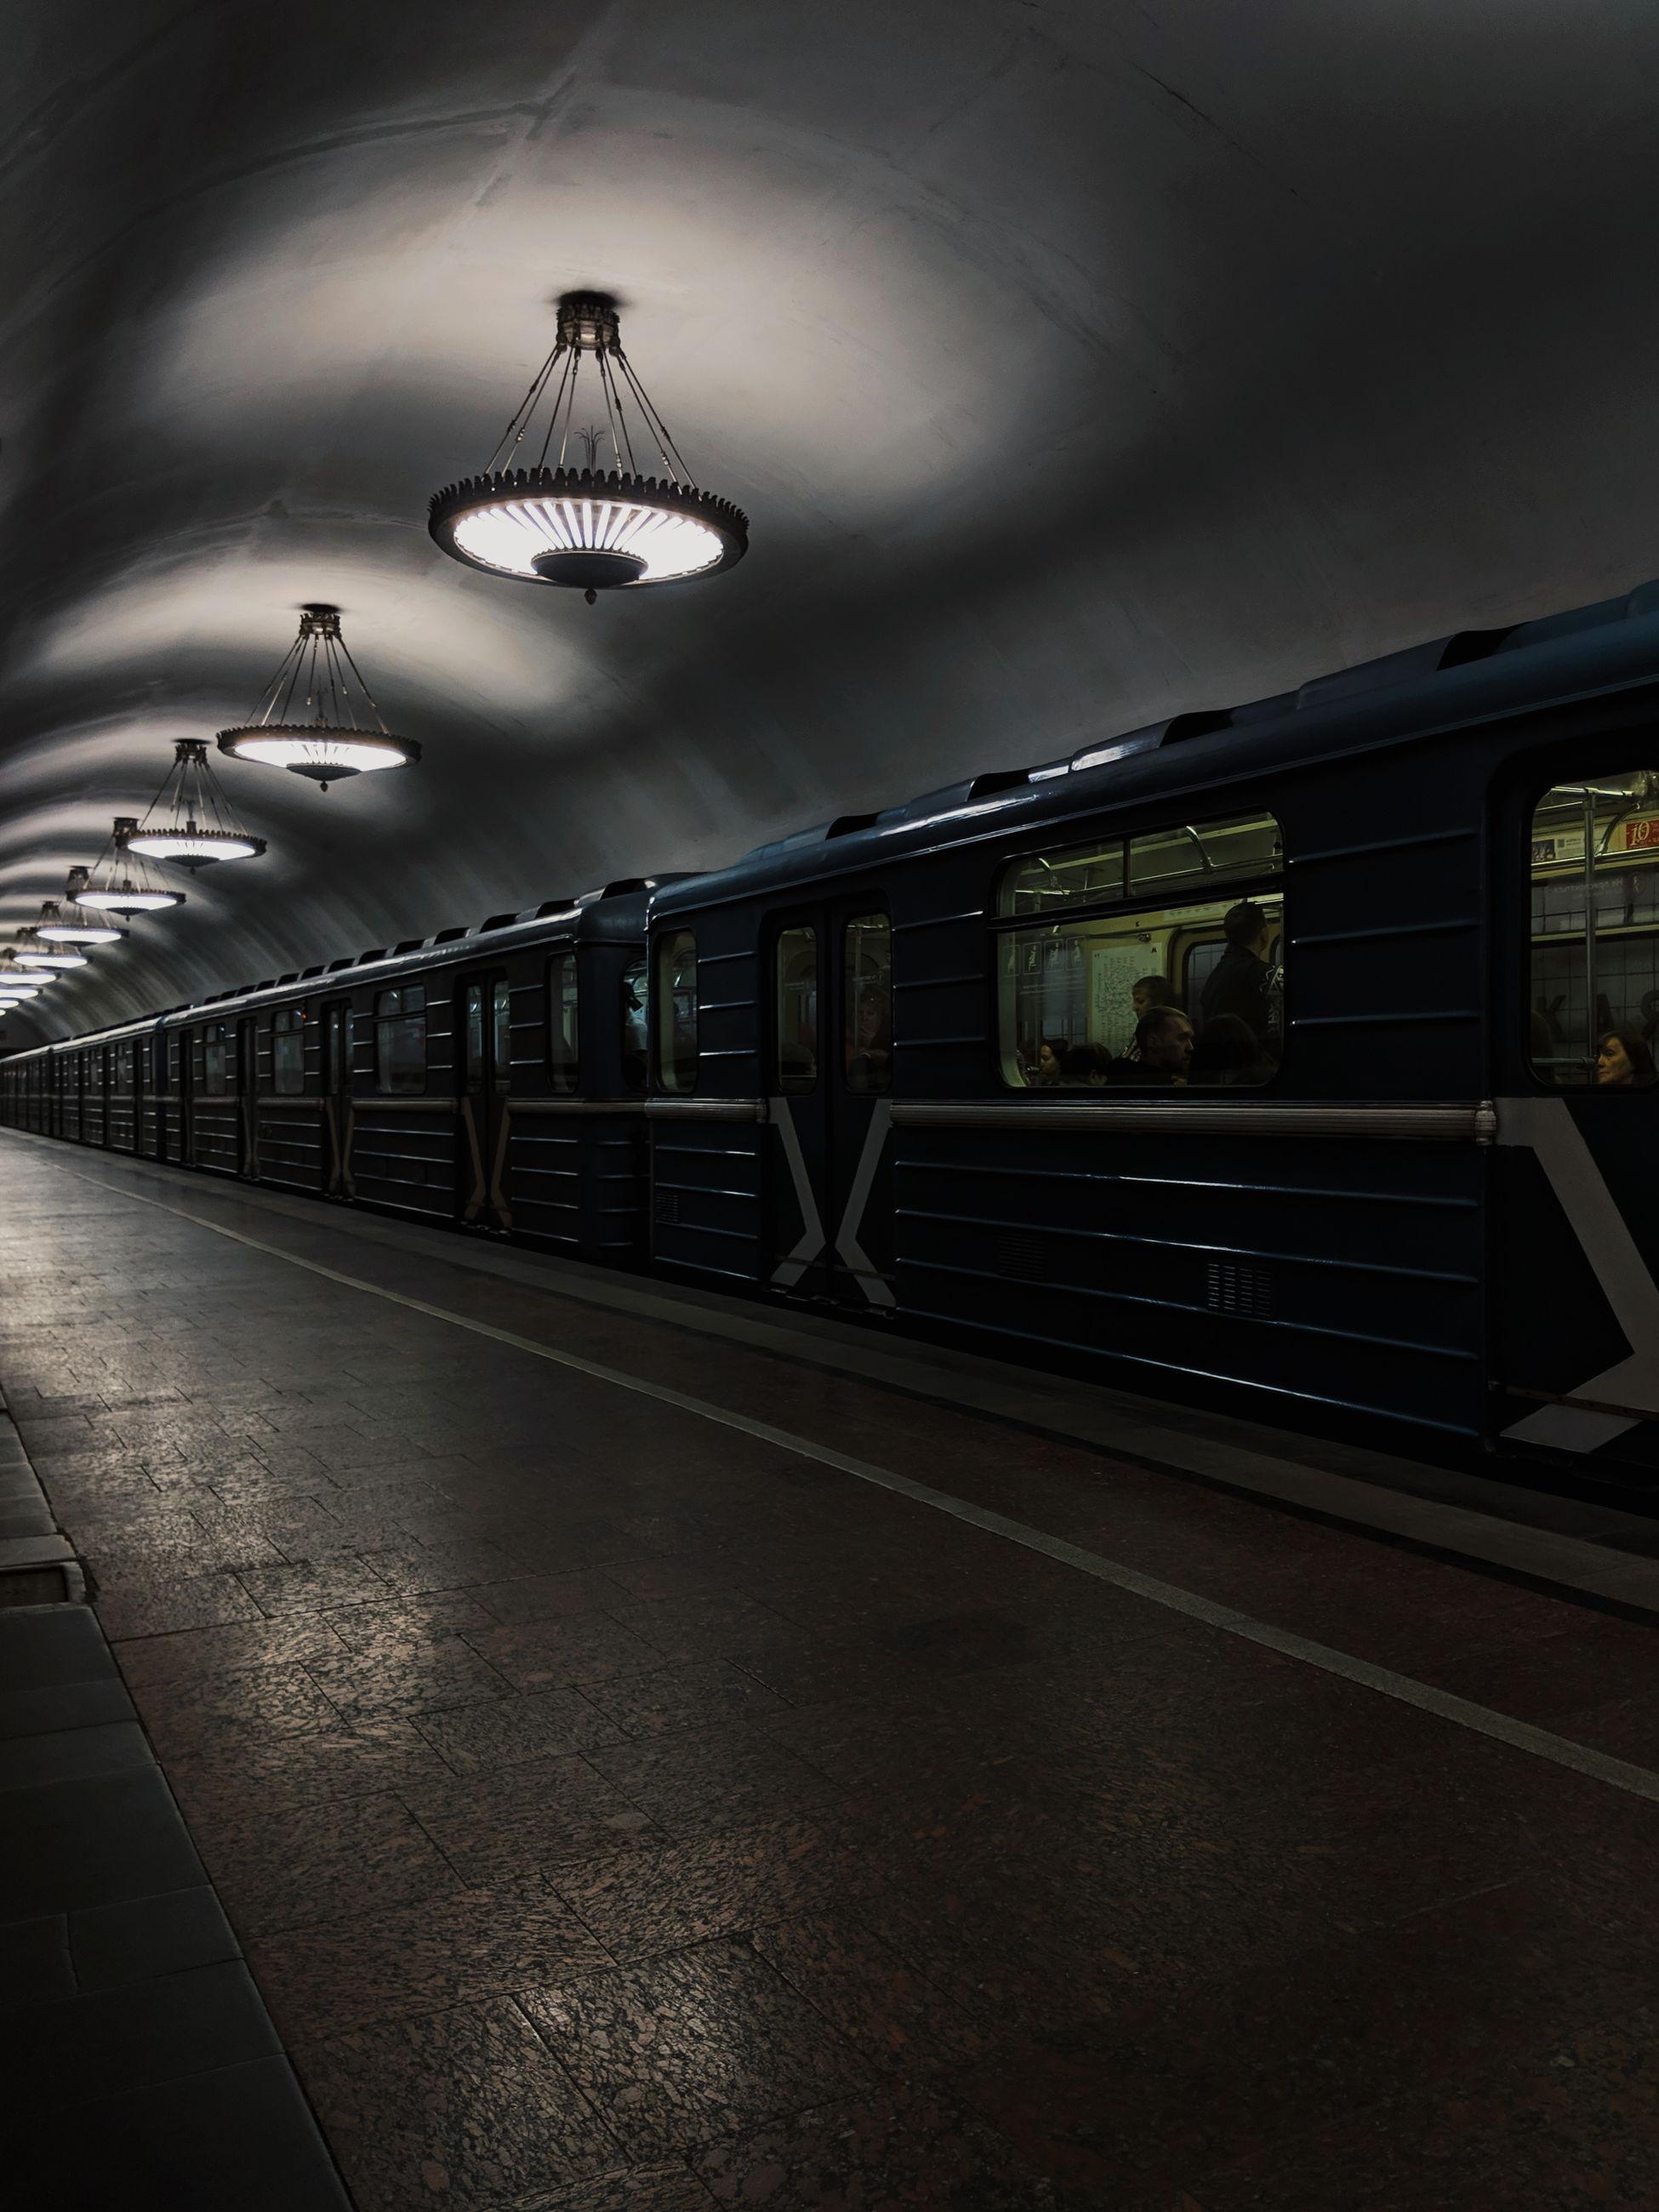 ILLUMINATED TRAIN AT RAILROAD STATION